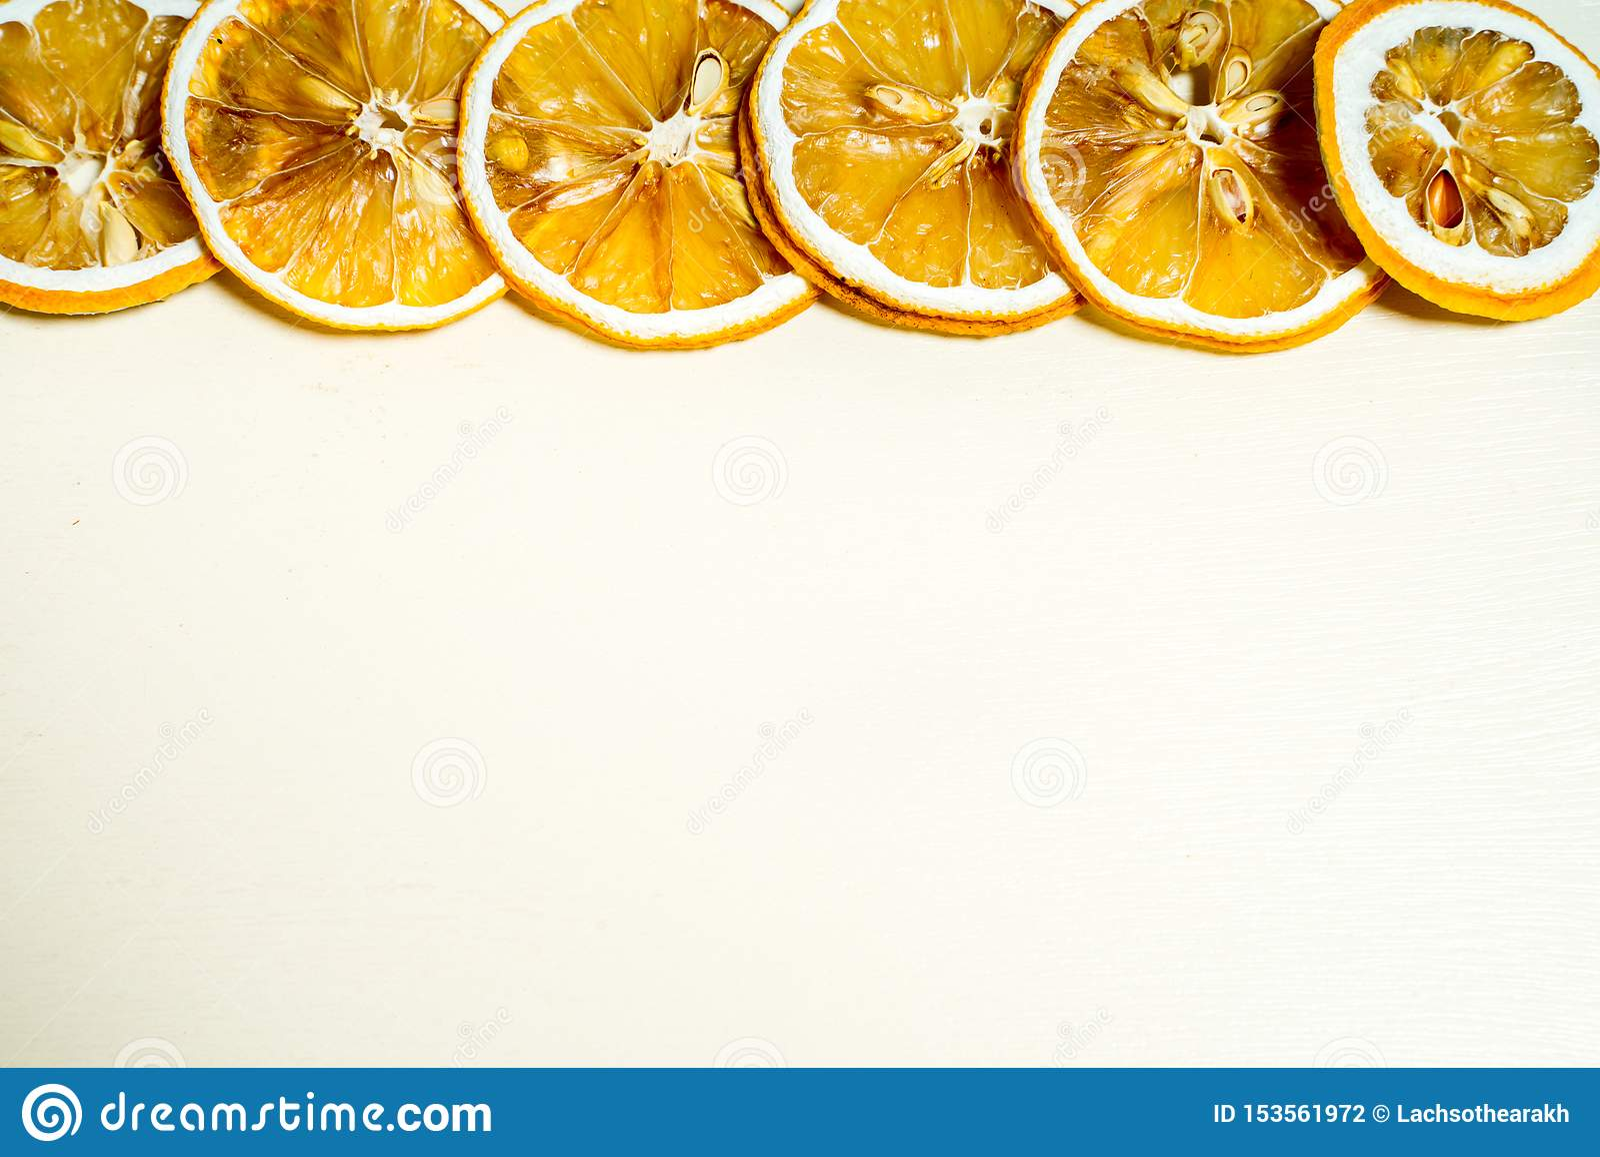 A row of lemon slice with seed inside